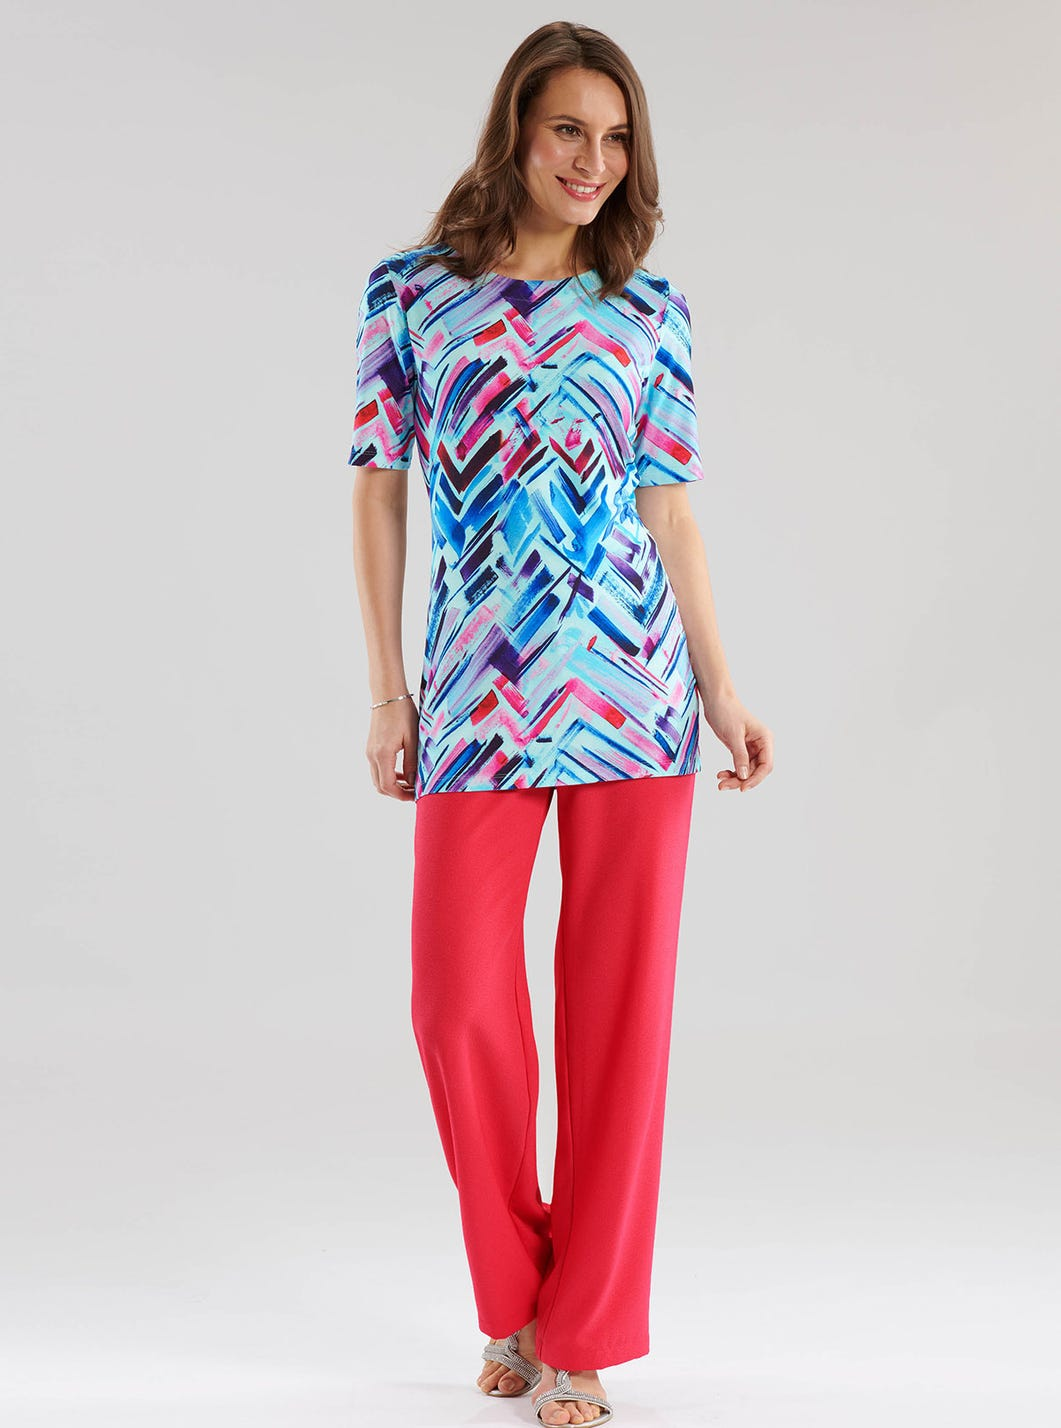 Tunique colorée en jersey